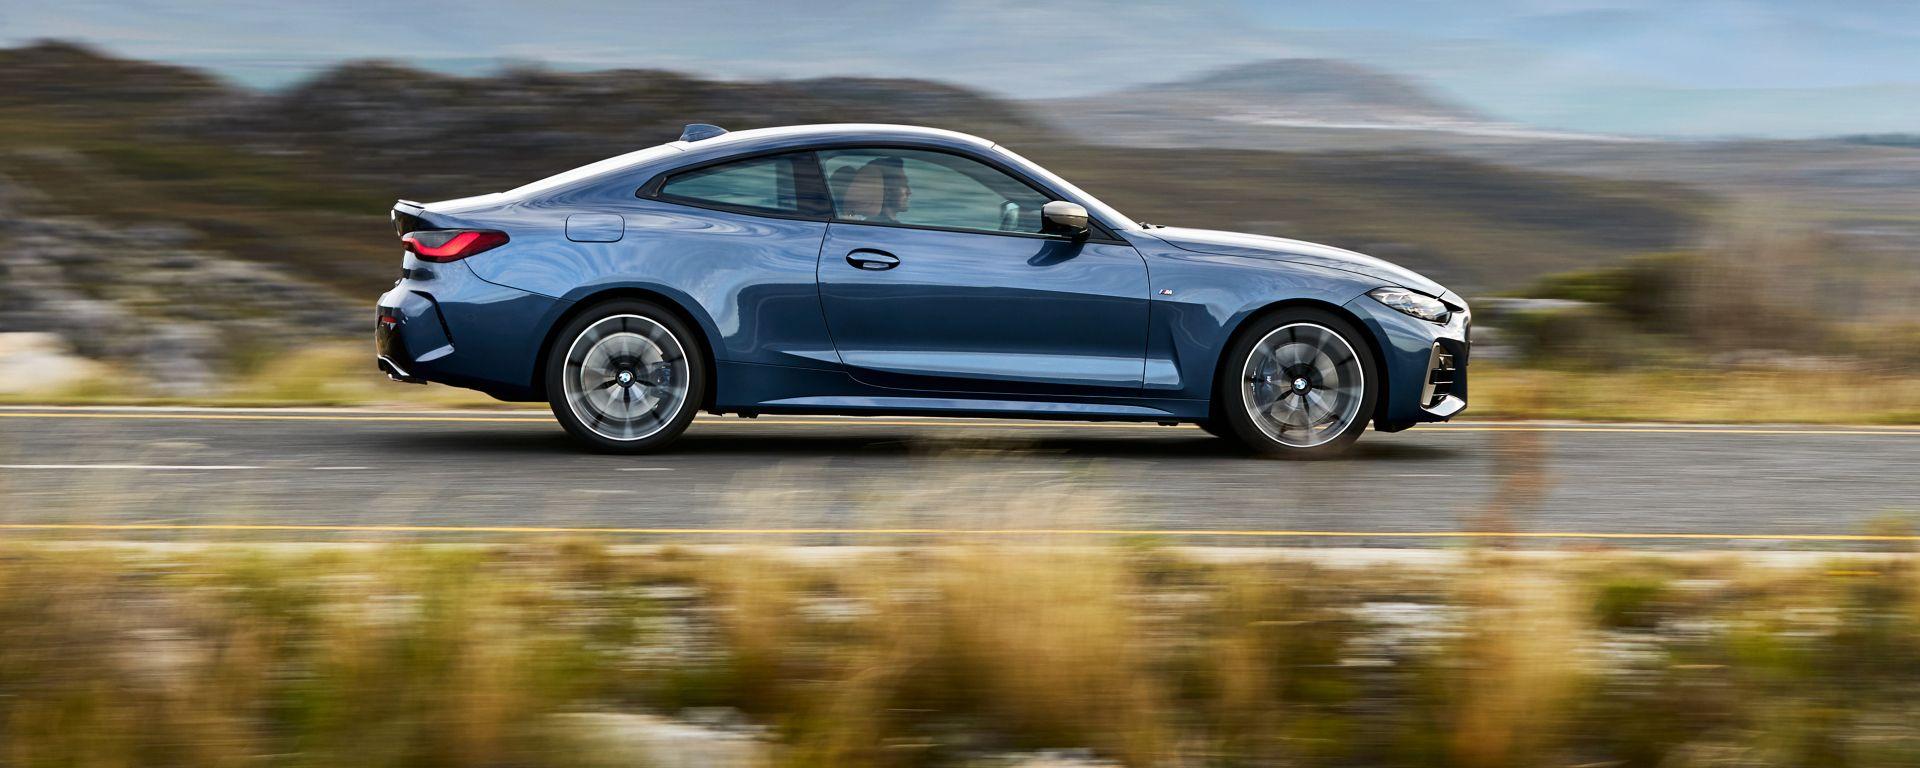 Nuova BMW Serie 4 Coupé, la fiancata